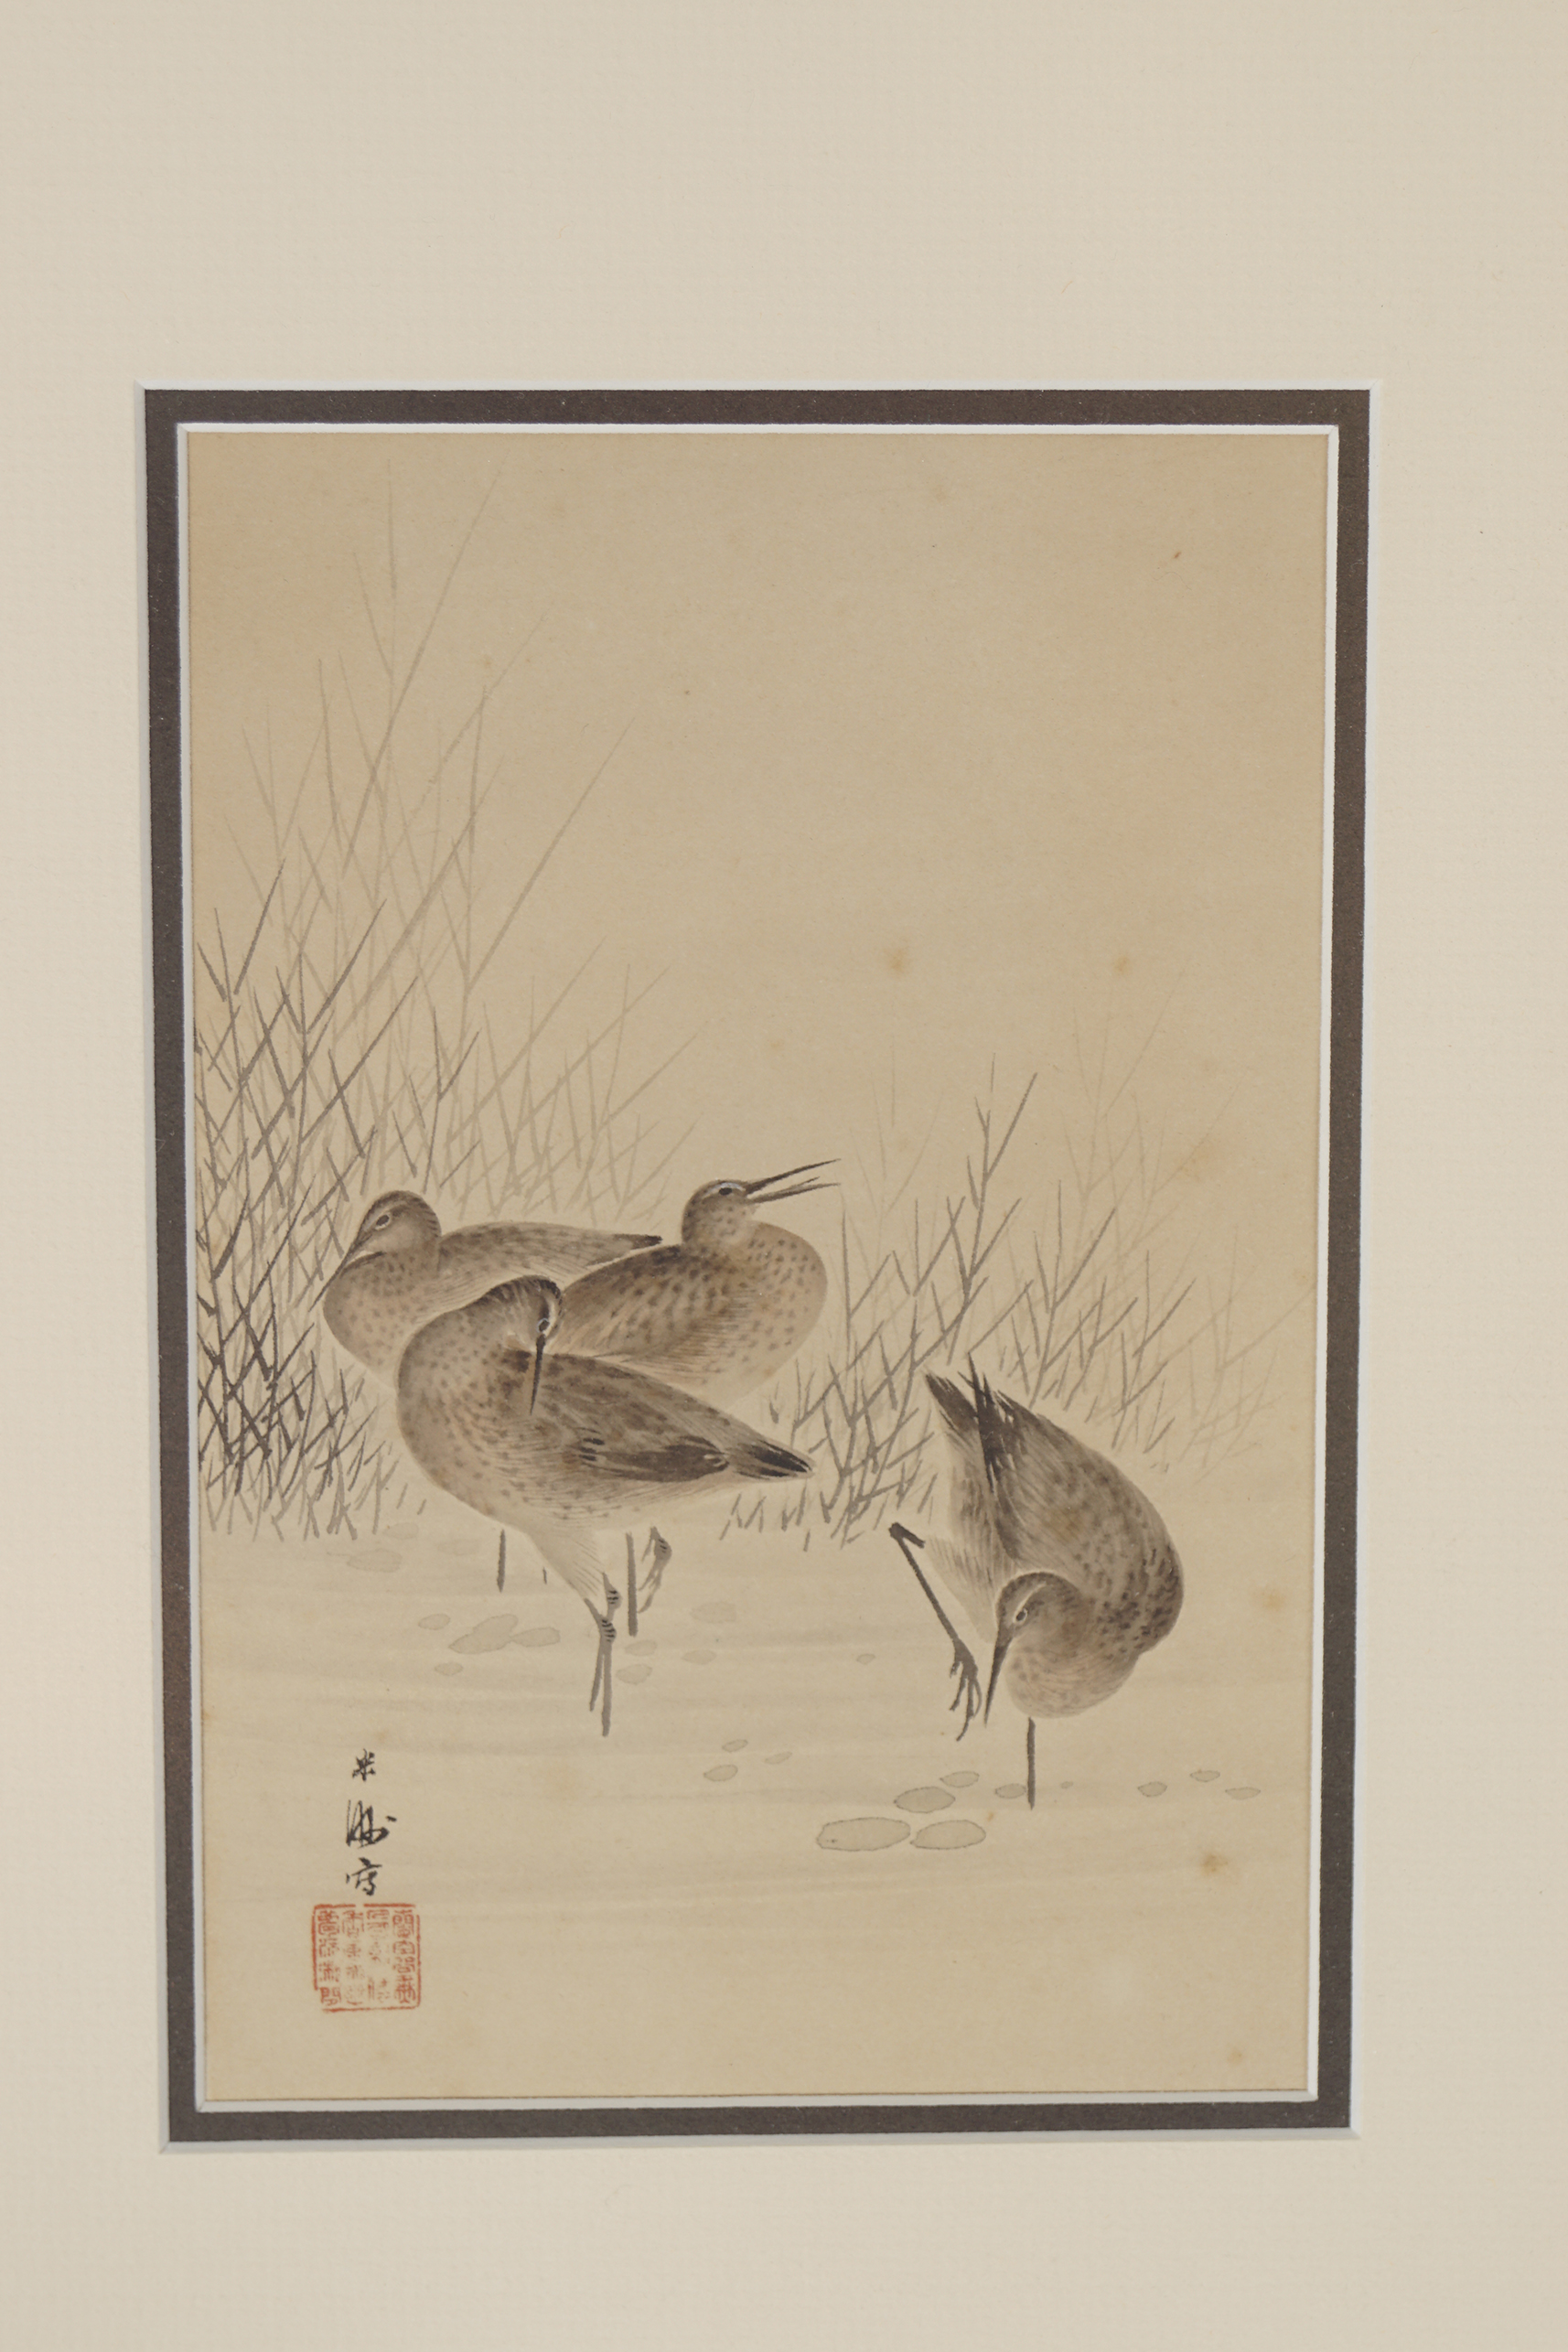 PAIR OF JAPANESE WOODBLOCK PRINTS - Image 2 of 3